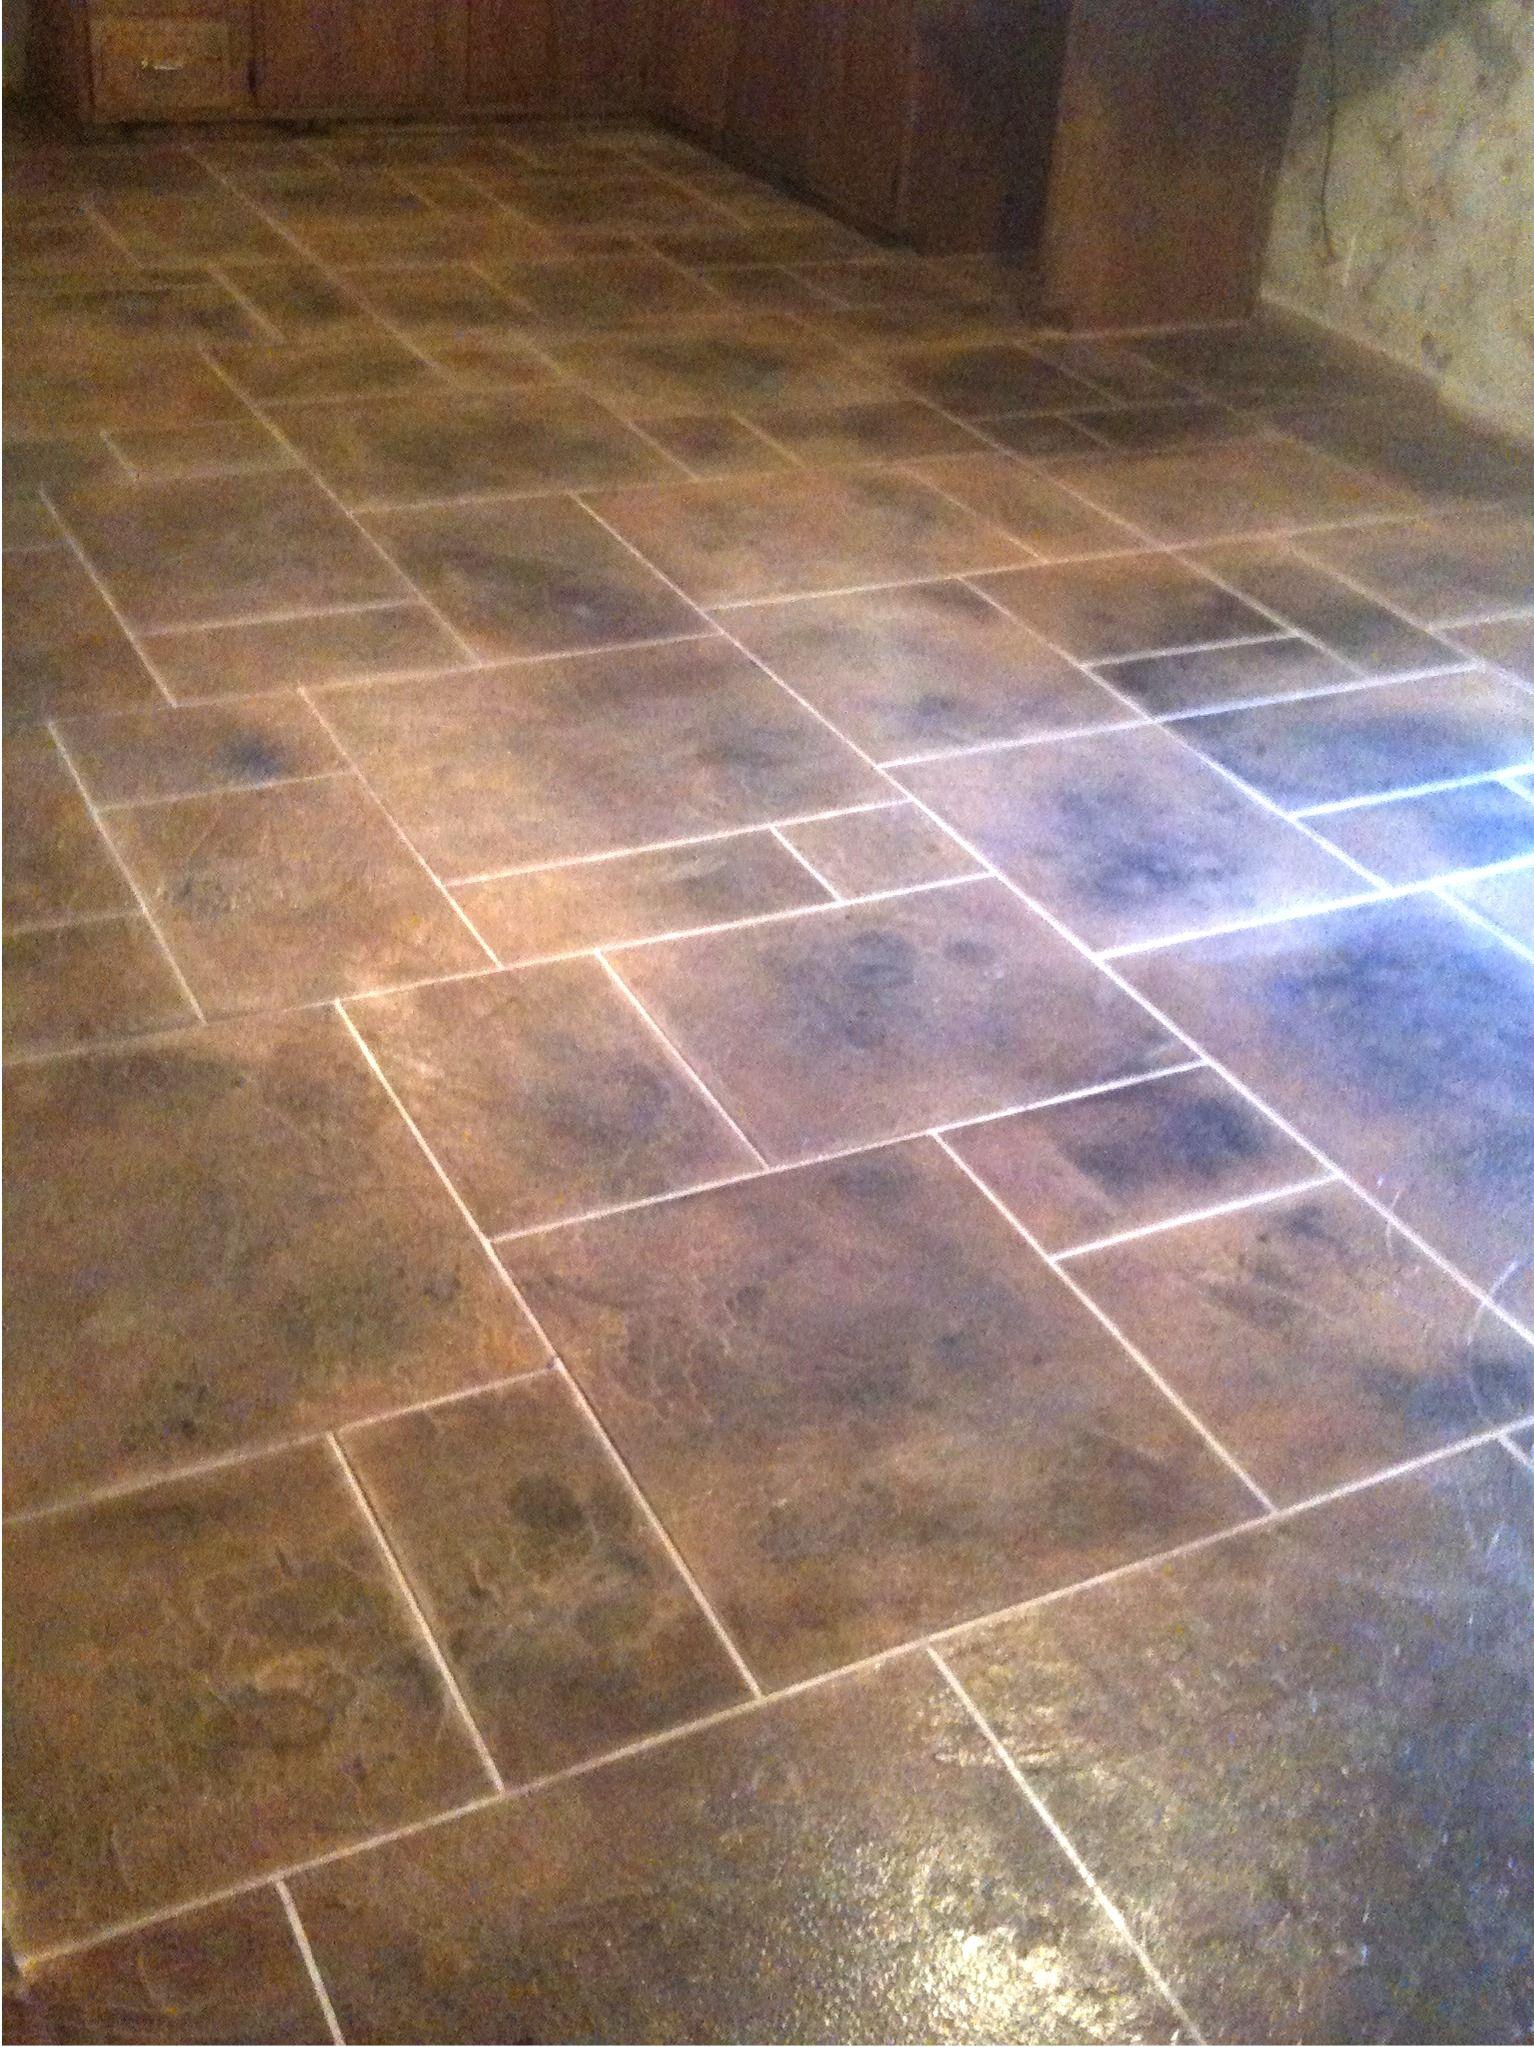 kitchen tile floor Kitchen Floor Tile Patterns concrete overlay random pattern stone tile kitchen floor